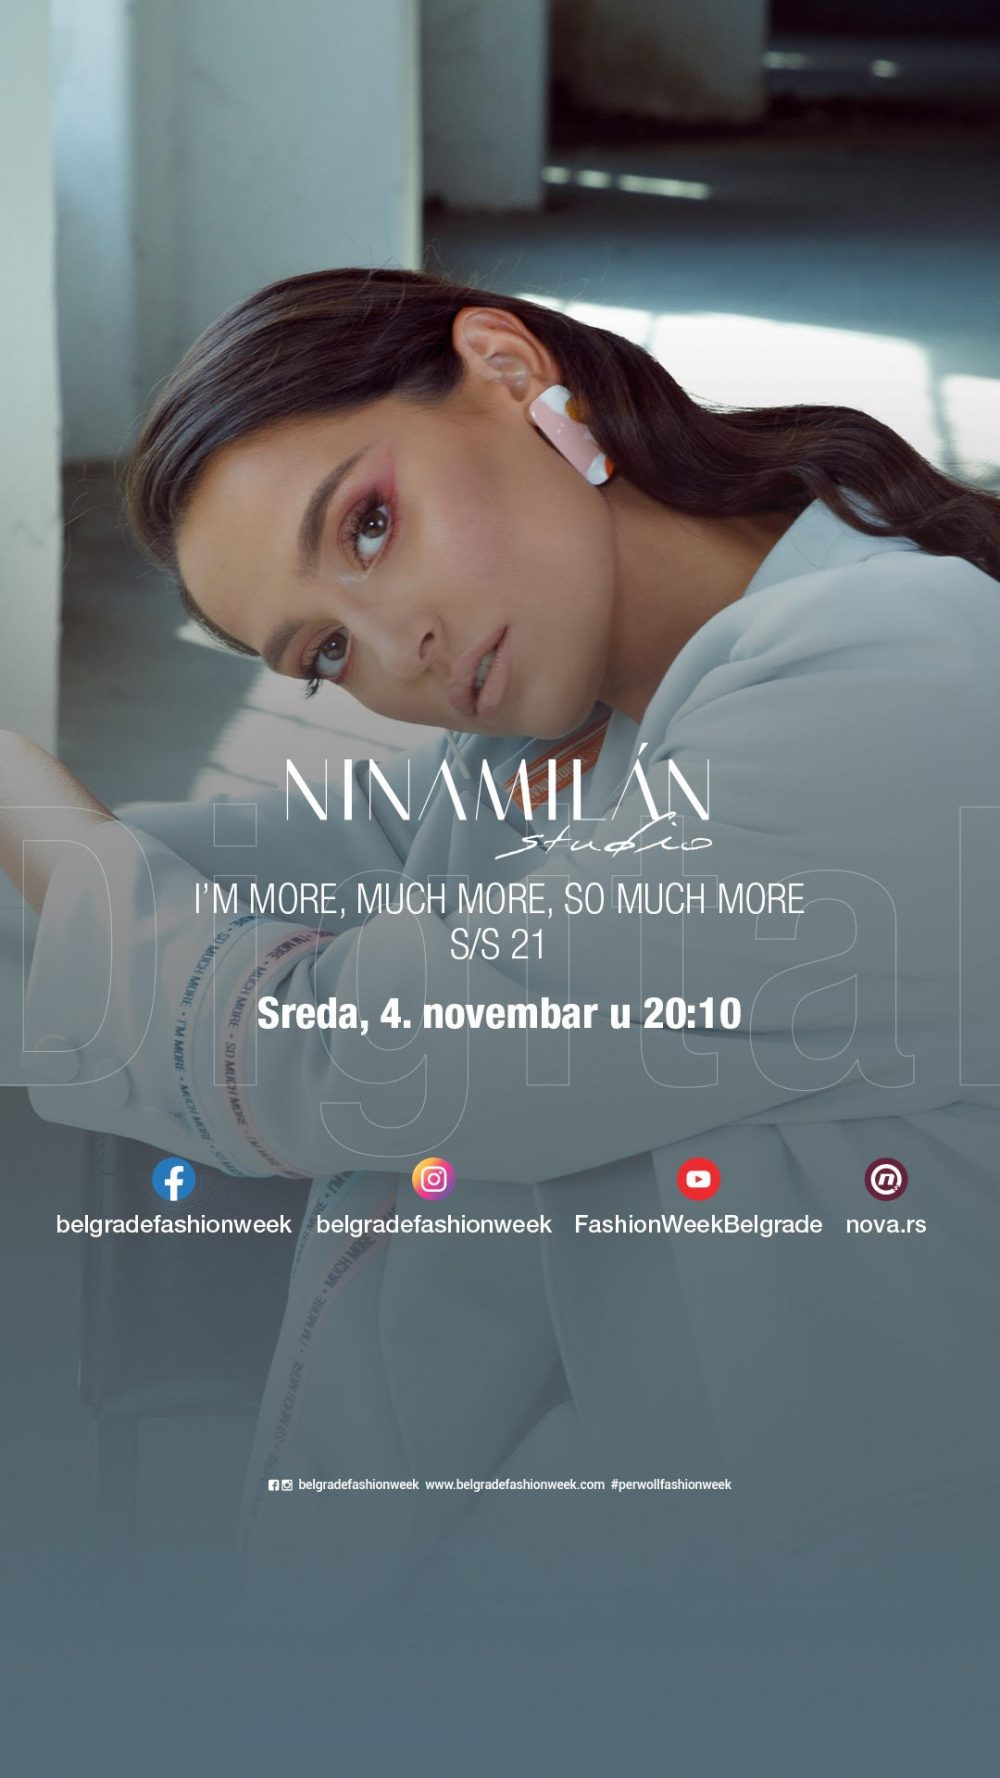 unnamed e1604493240604 Nina Milović: IM MORE, MUCH MORE, SO MUCH MORE